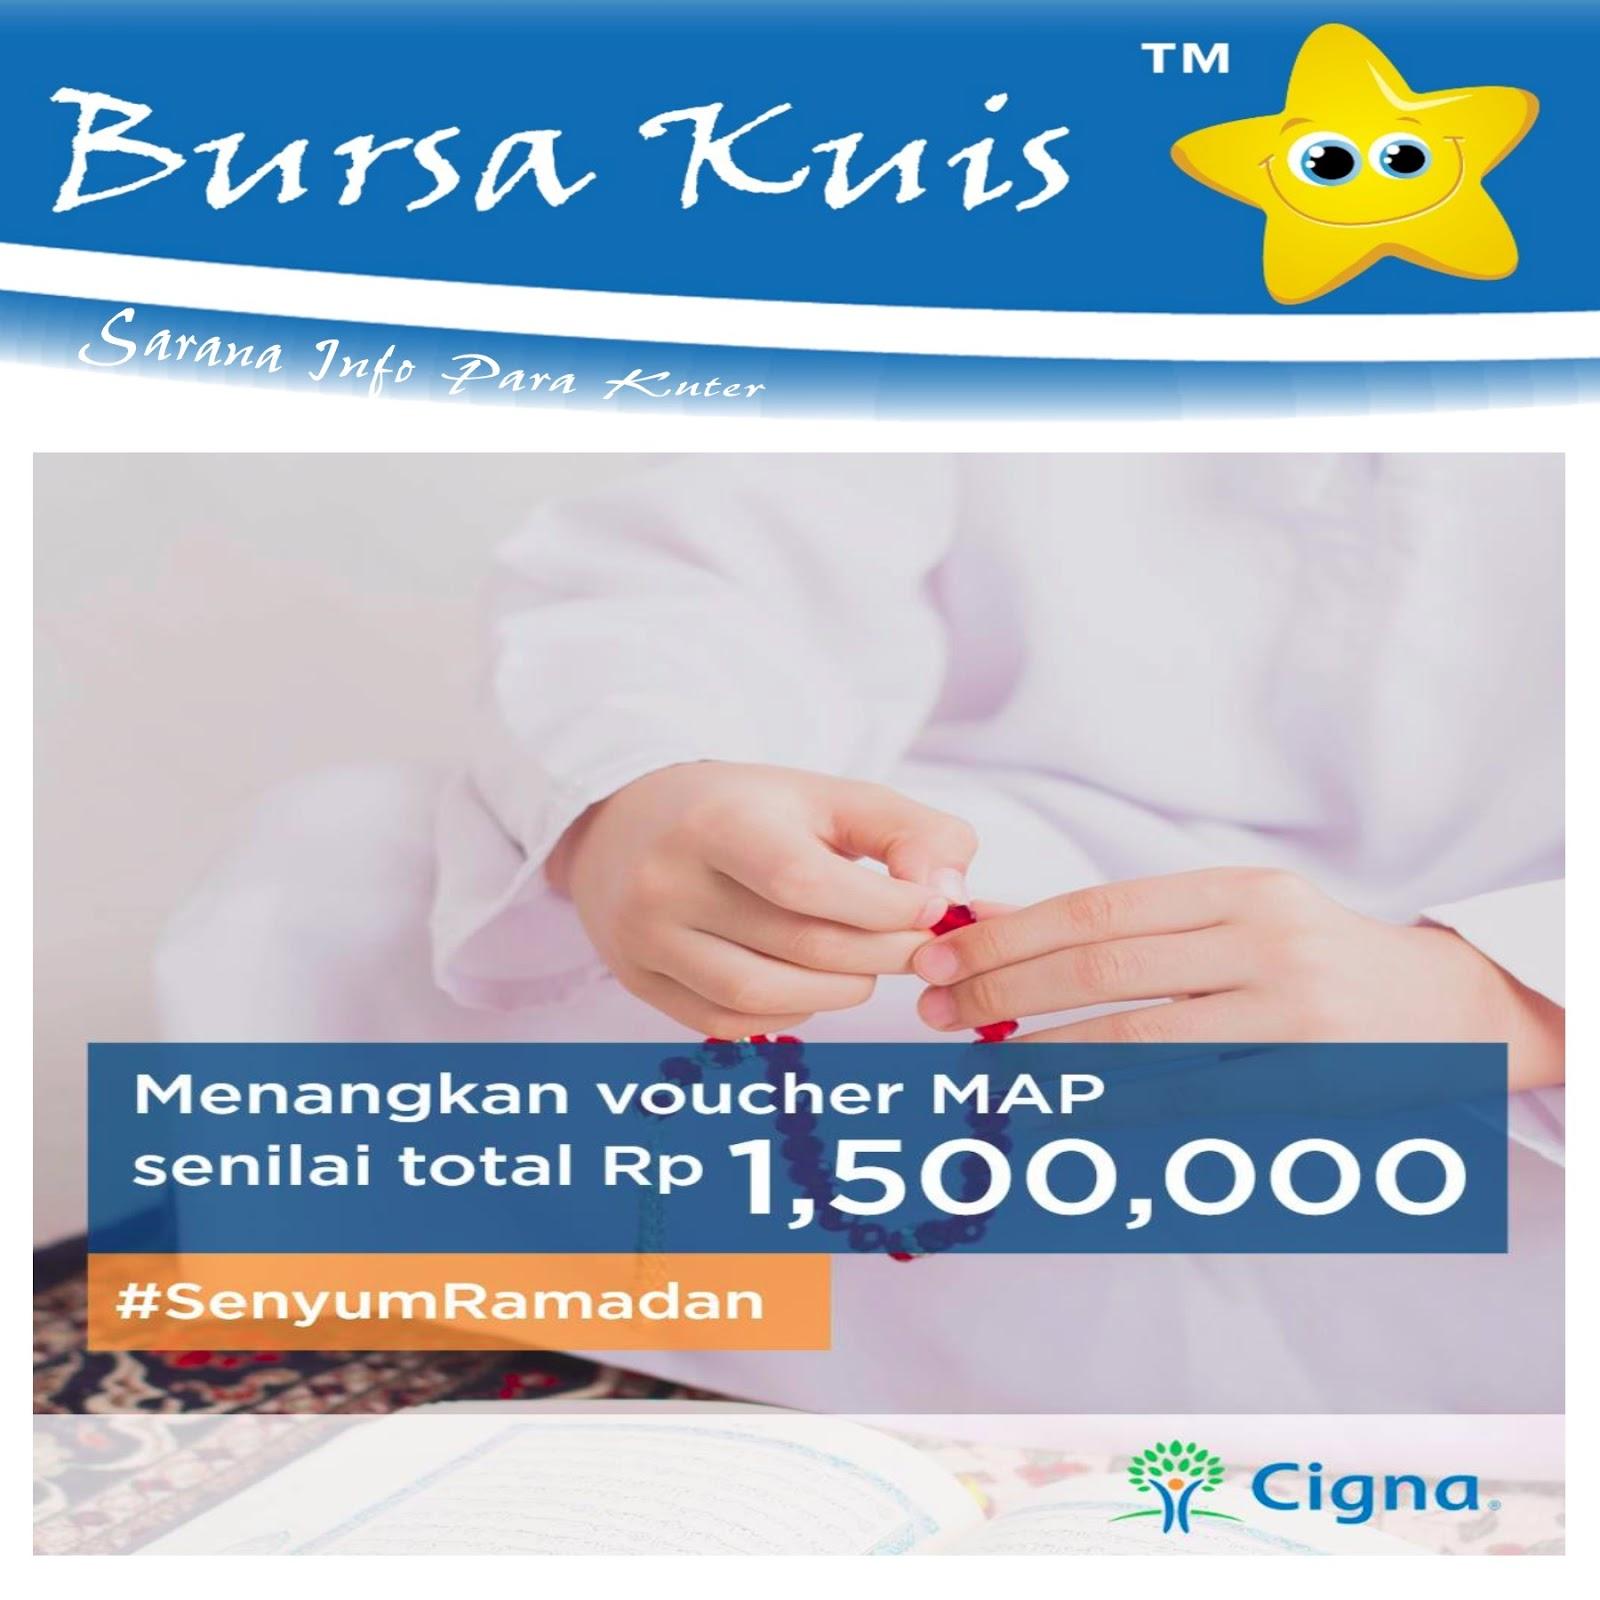 Voucher Map Senilai 1 Juta Daftar Harga Terkini Termurah Dan 500k Bahana Jaya Kuis Senyum Ramadhan Cigna Berhadiah Belanja Total 15 Rupiah